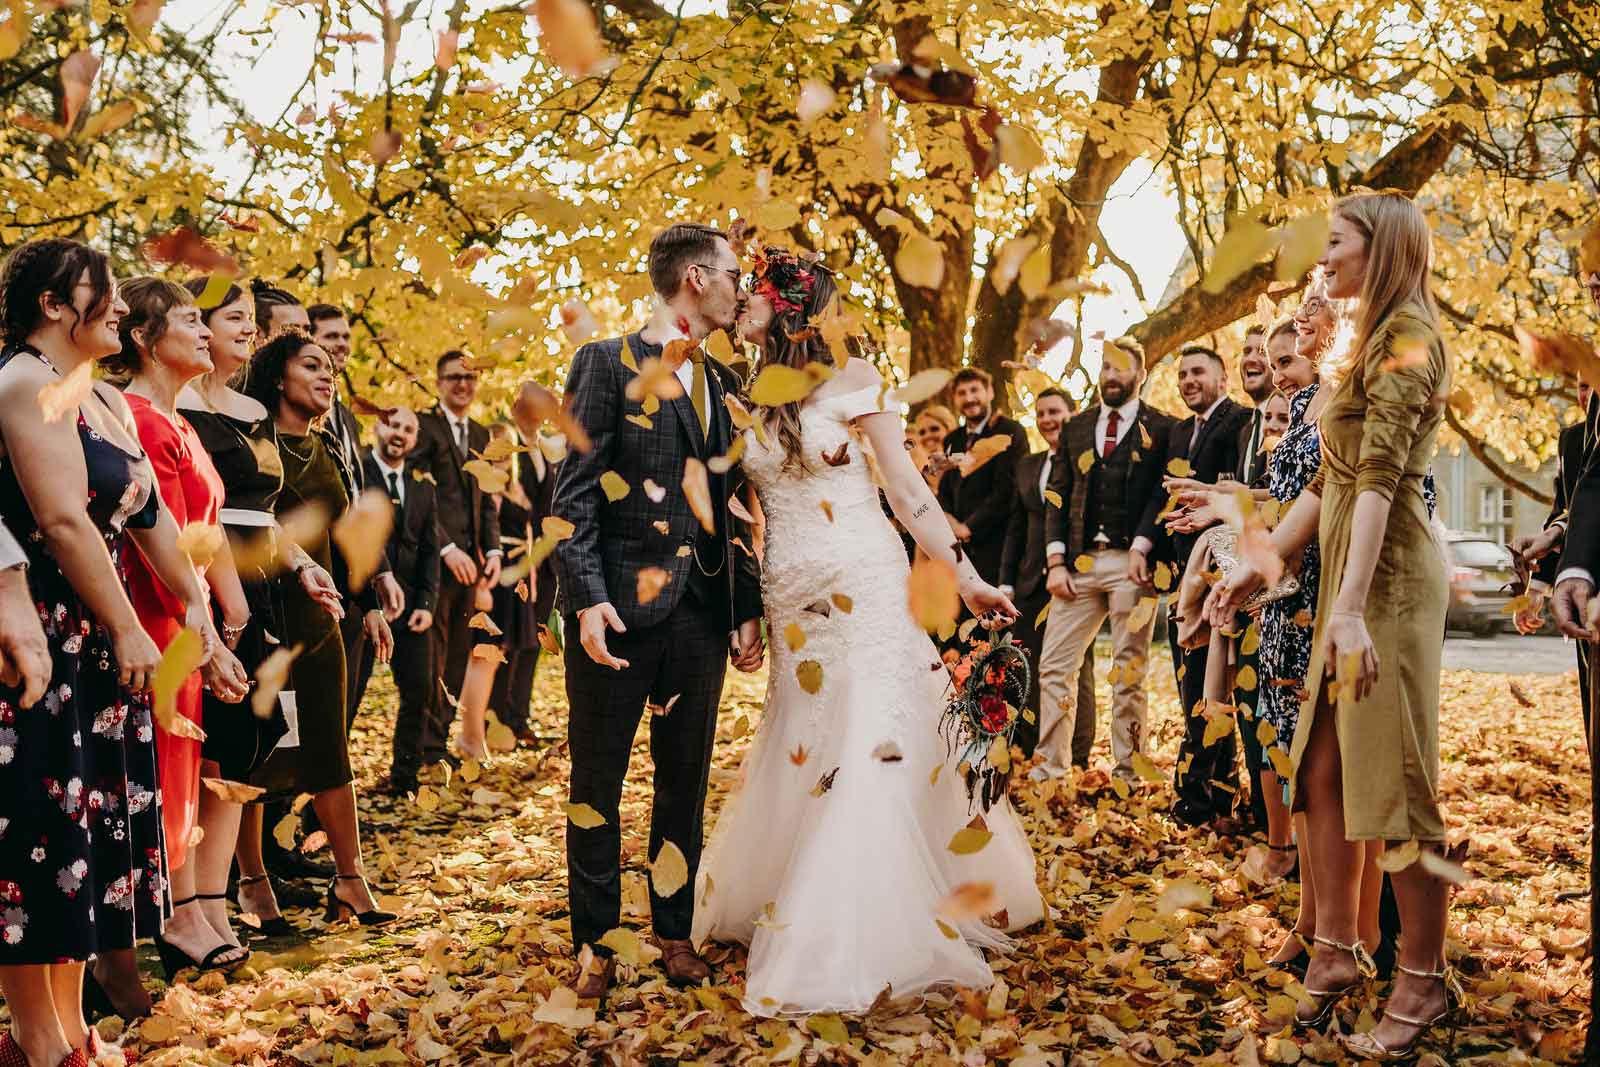 Unique Leaves Confetti Wedding Photo - Sorrento Wedding Photographers and Videographers